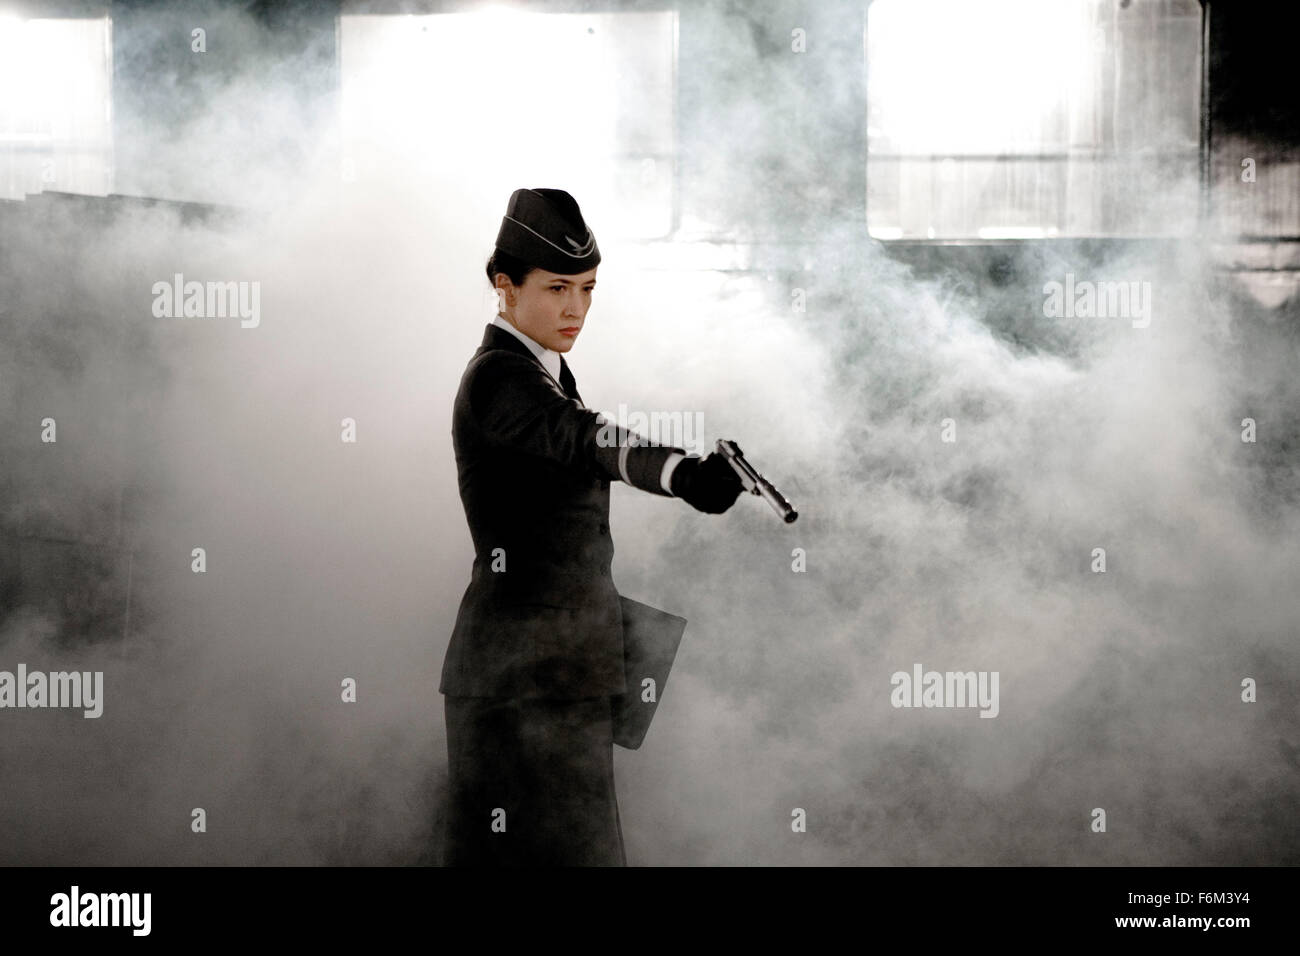 RELEASE DATE: 5 March 2008 . MOVIE TITLE: Les Femmes de l'ombre aka Female Agents. STUDIO: Cineart. PLOT: In - Stock Image